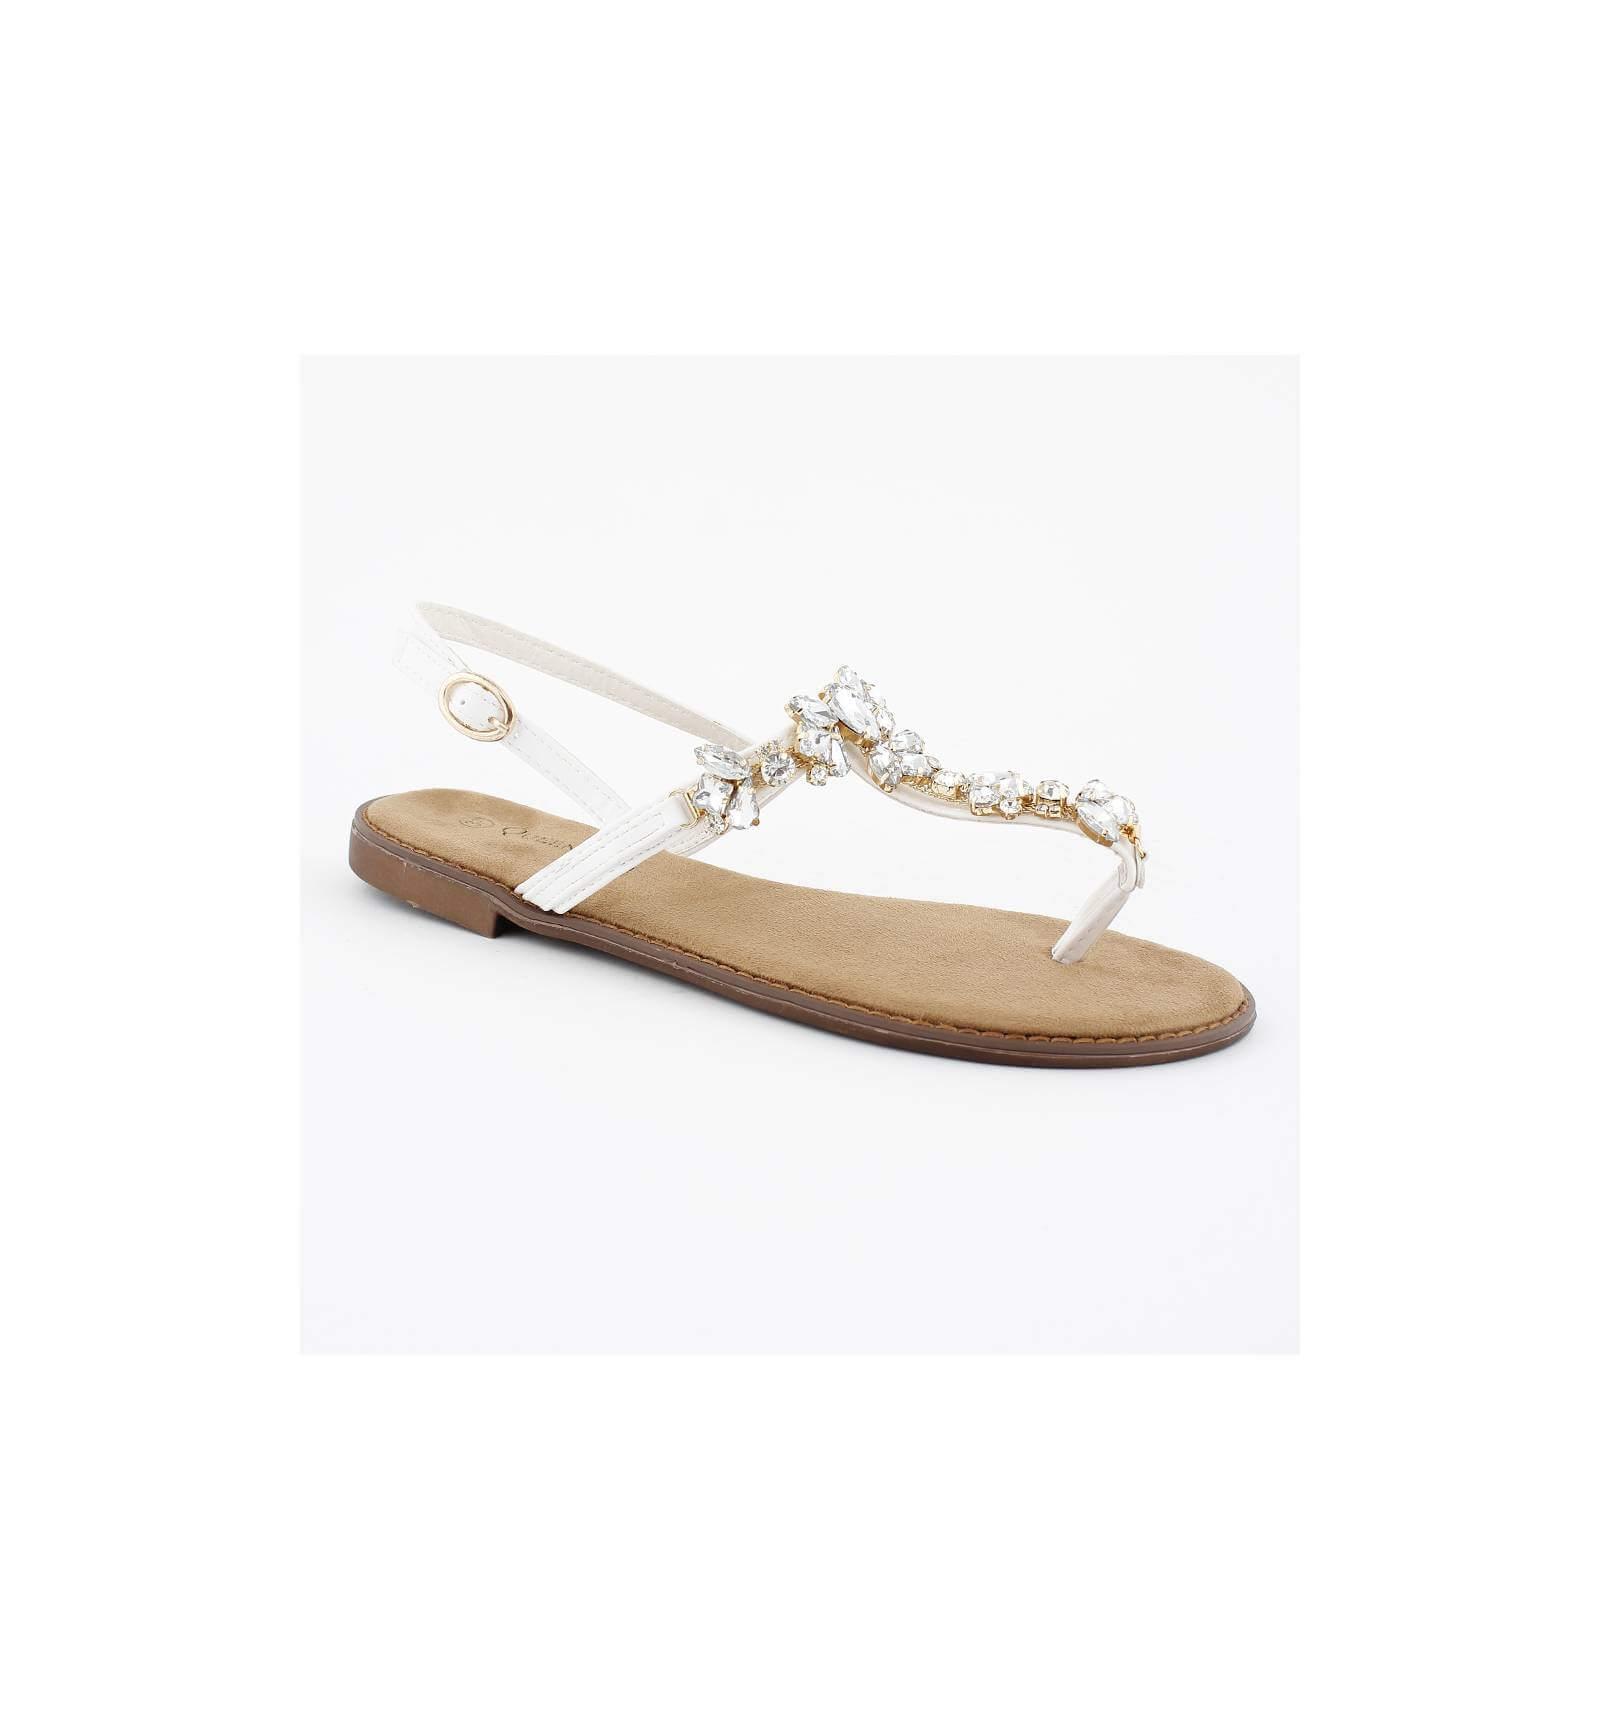 sandales femme tendance simili cuir blanc avec perles blanches stissy. Black Bedroom Furniture Sets. Home Design Ideas